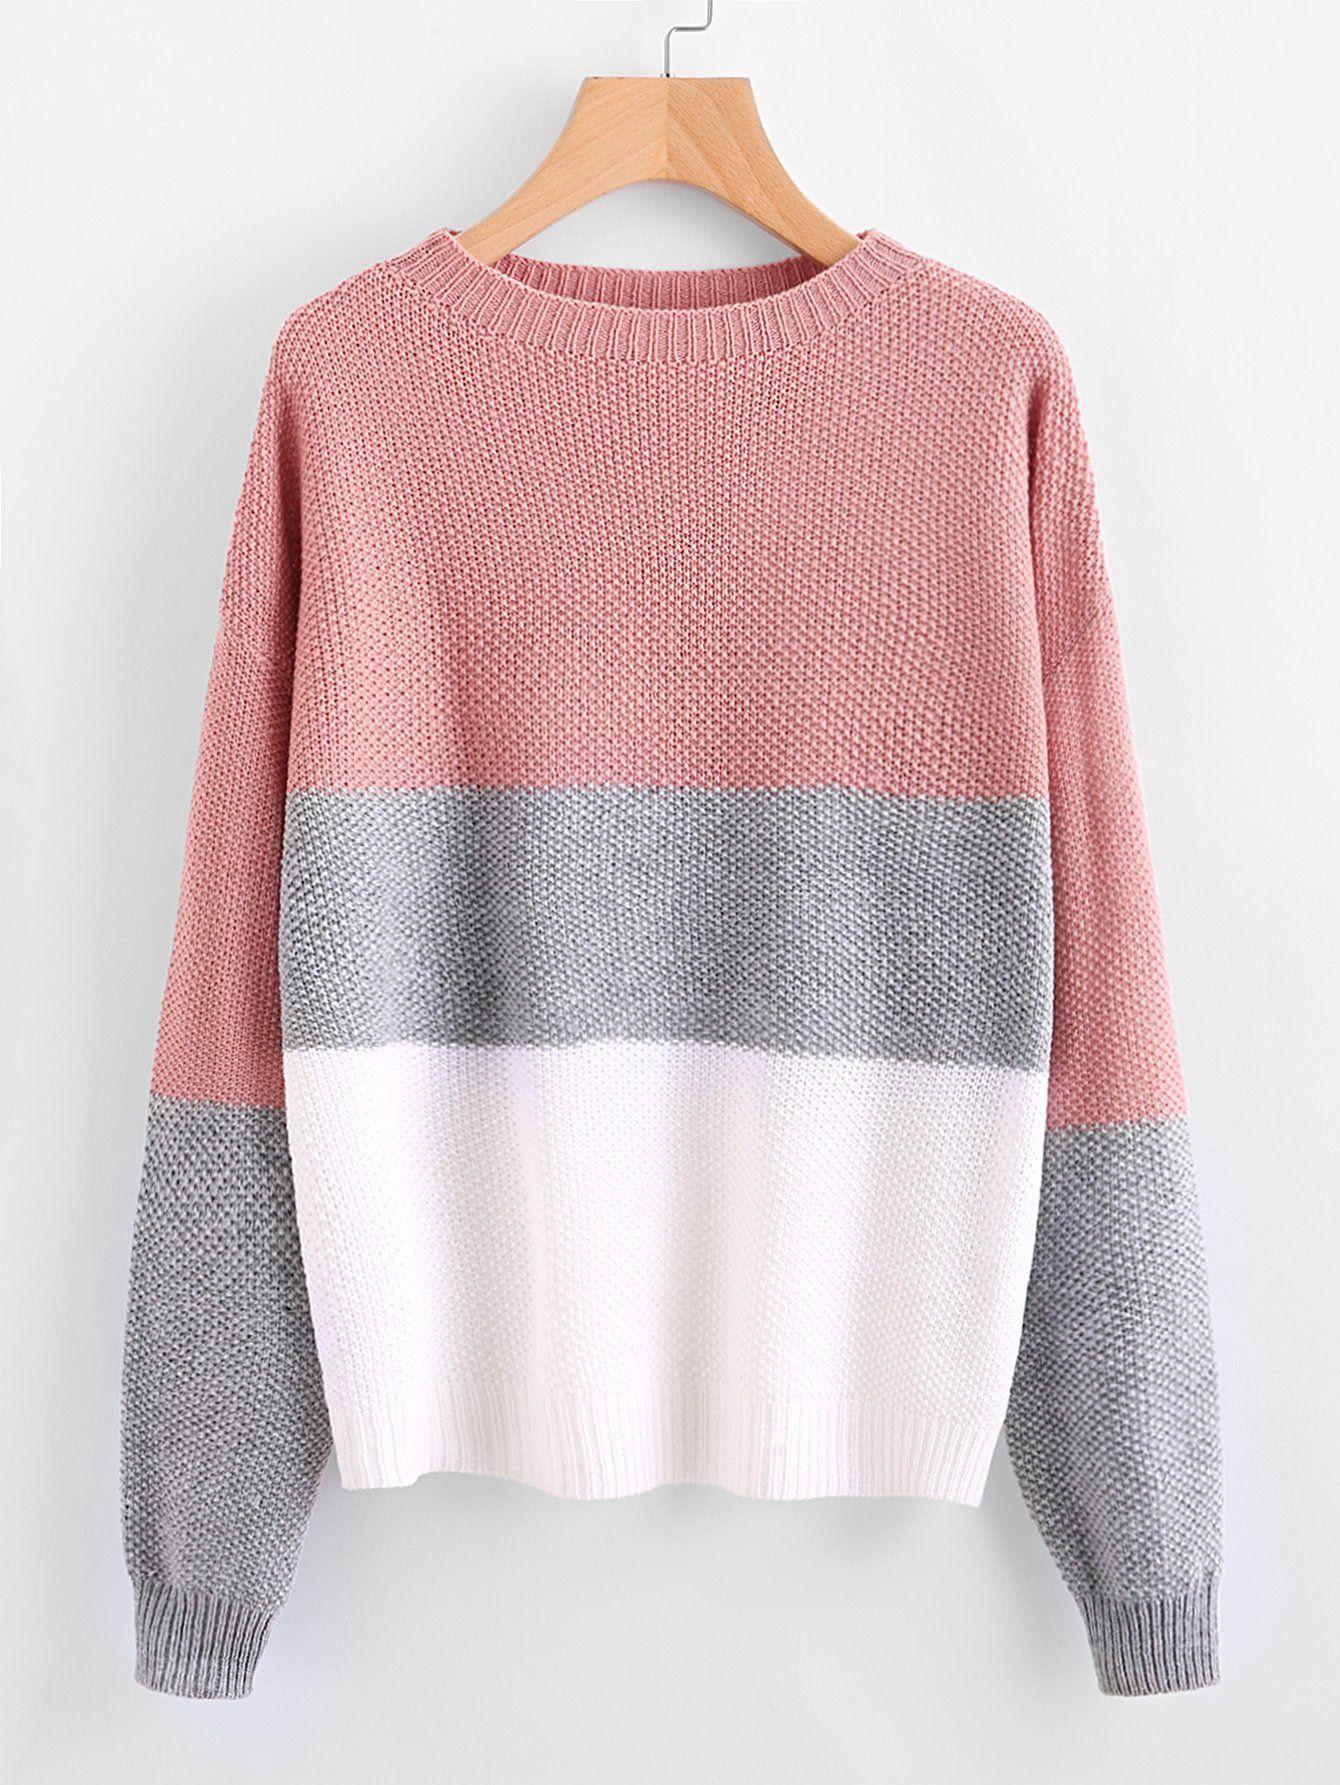 ce12bc3e9 Multicolor Color Block Drop Shoulder Textured Sweater